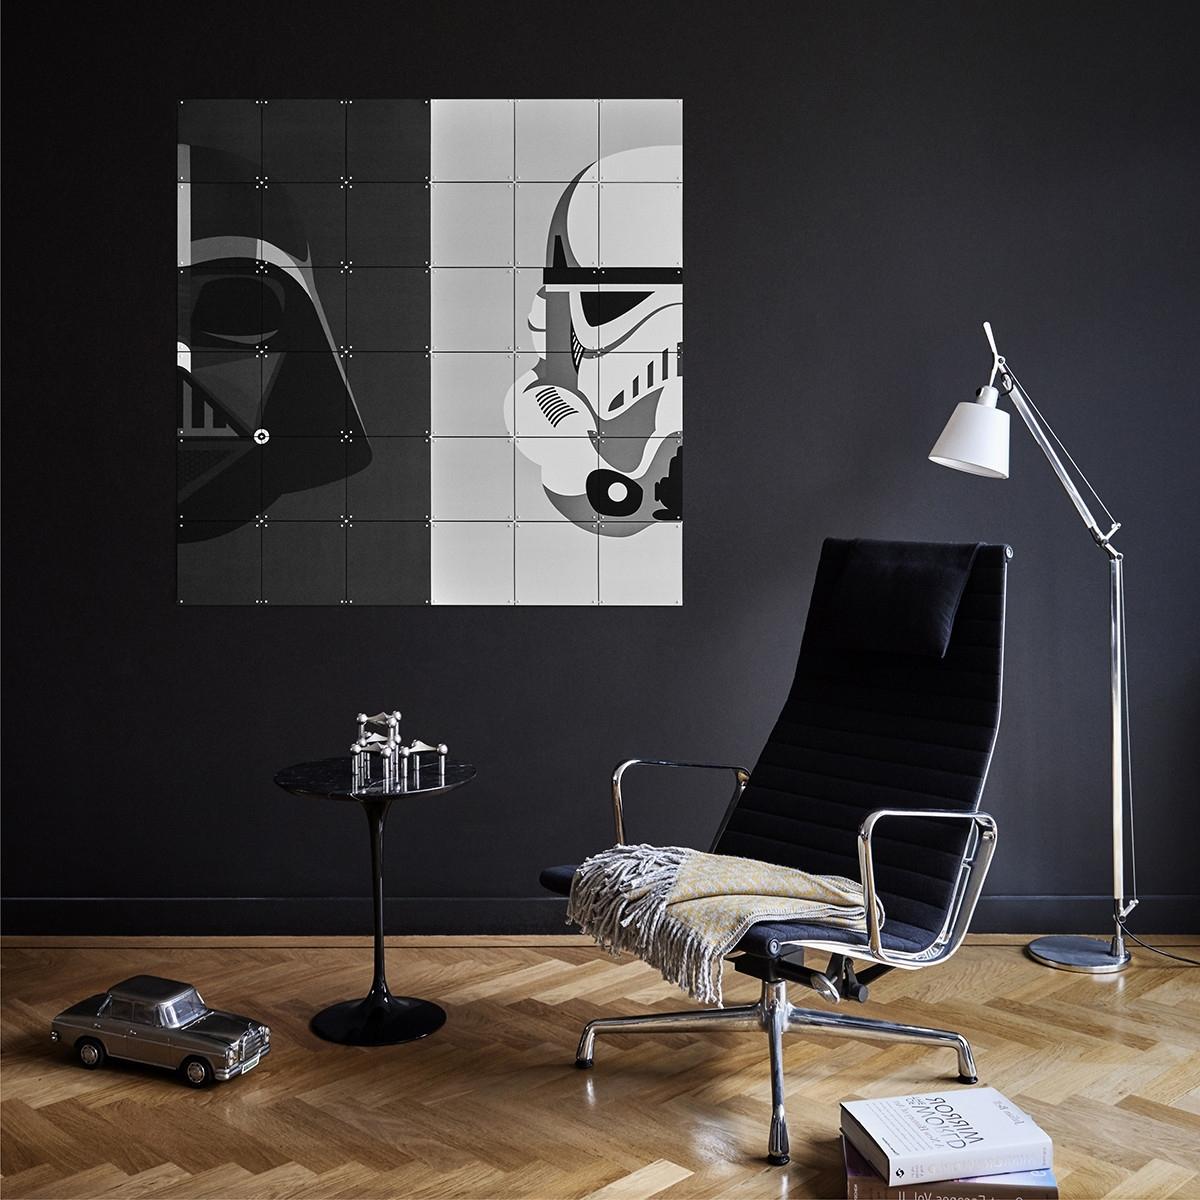 Darth Vader Wall Art In Most Recent Star Wars Stormtrooper/darth Vader Wall Art Panels – The Basiq (View 1 of 15)